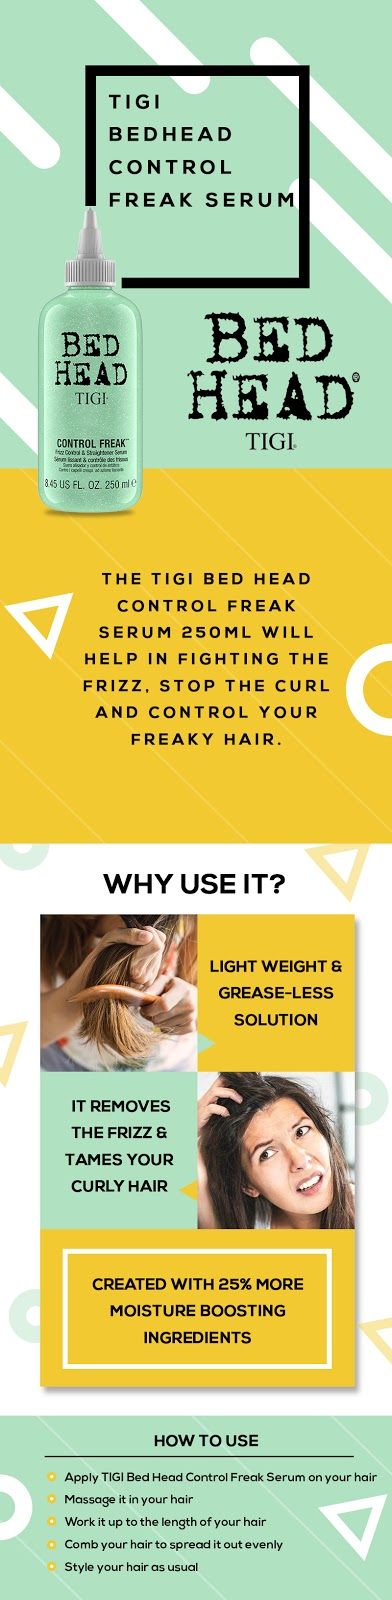 tigi bed head serum